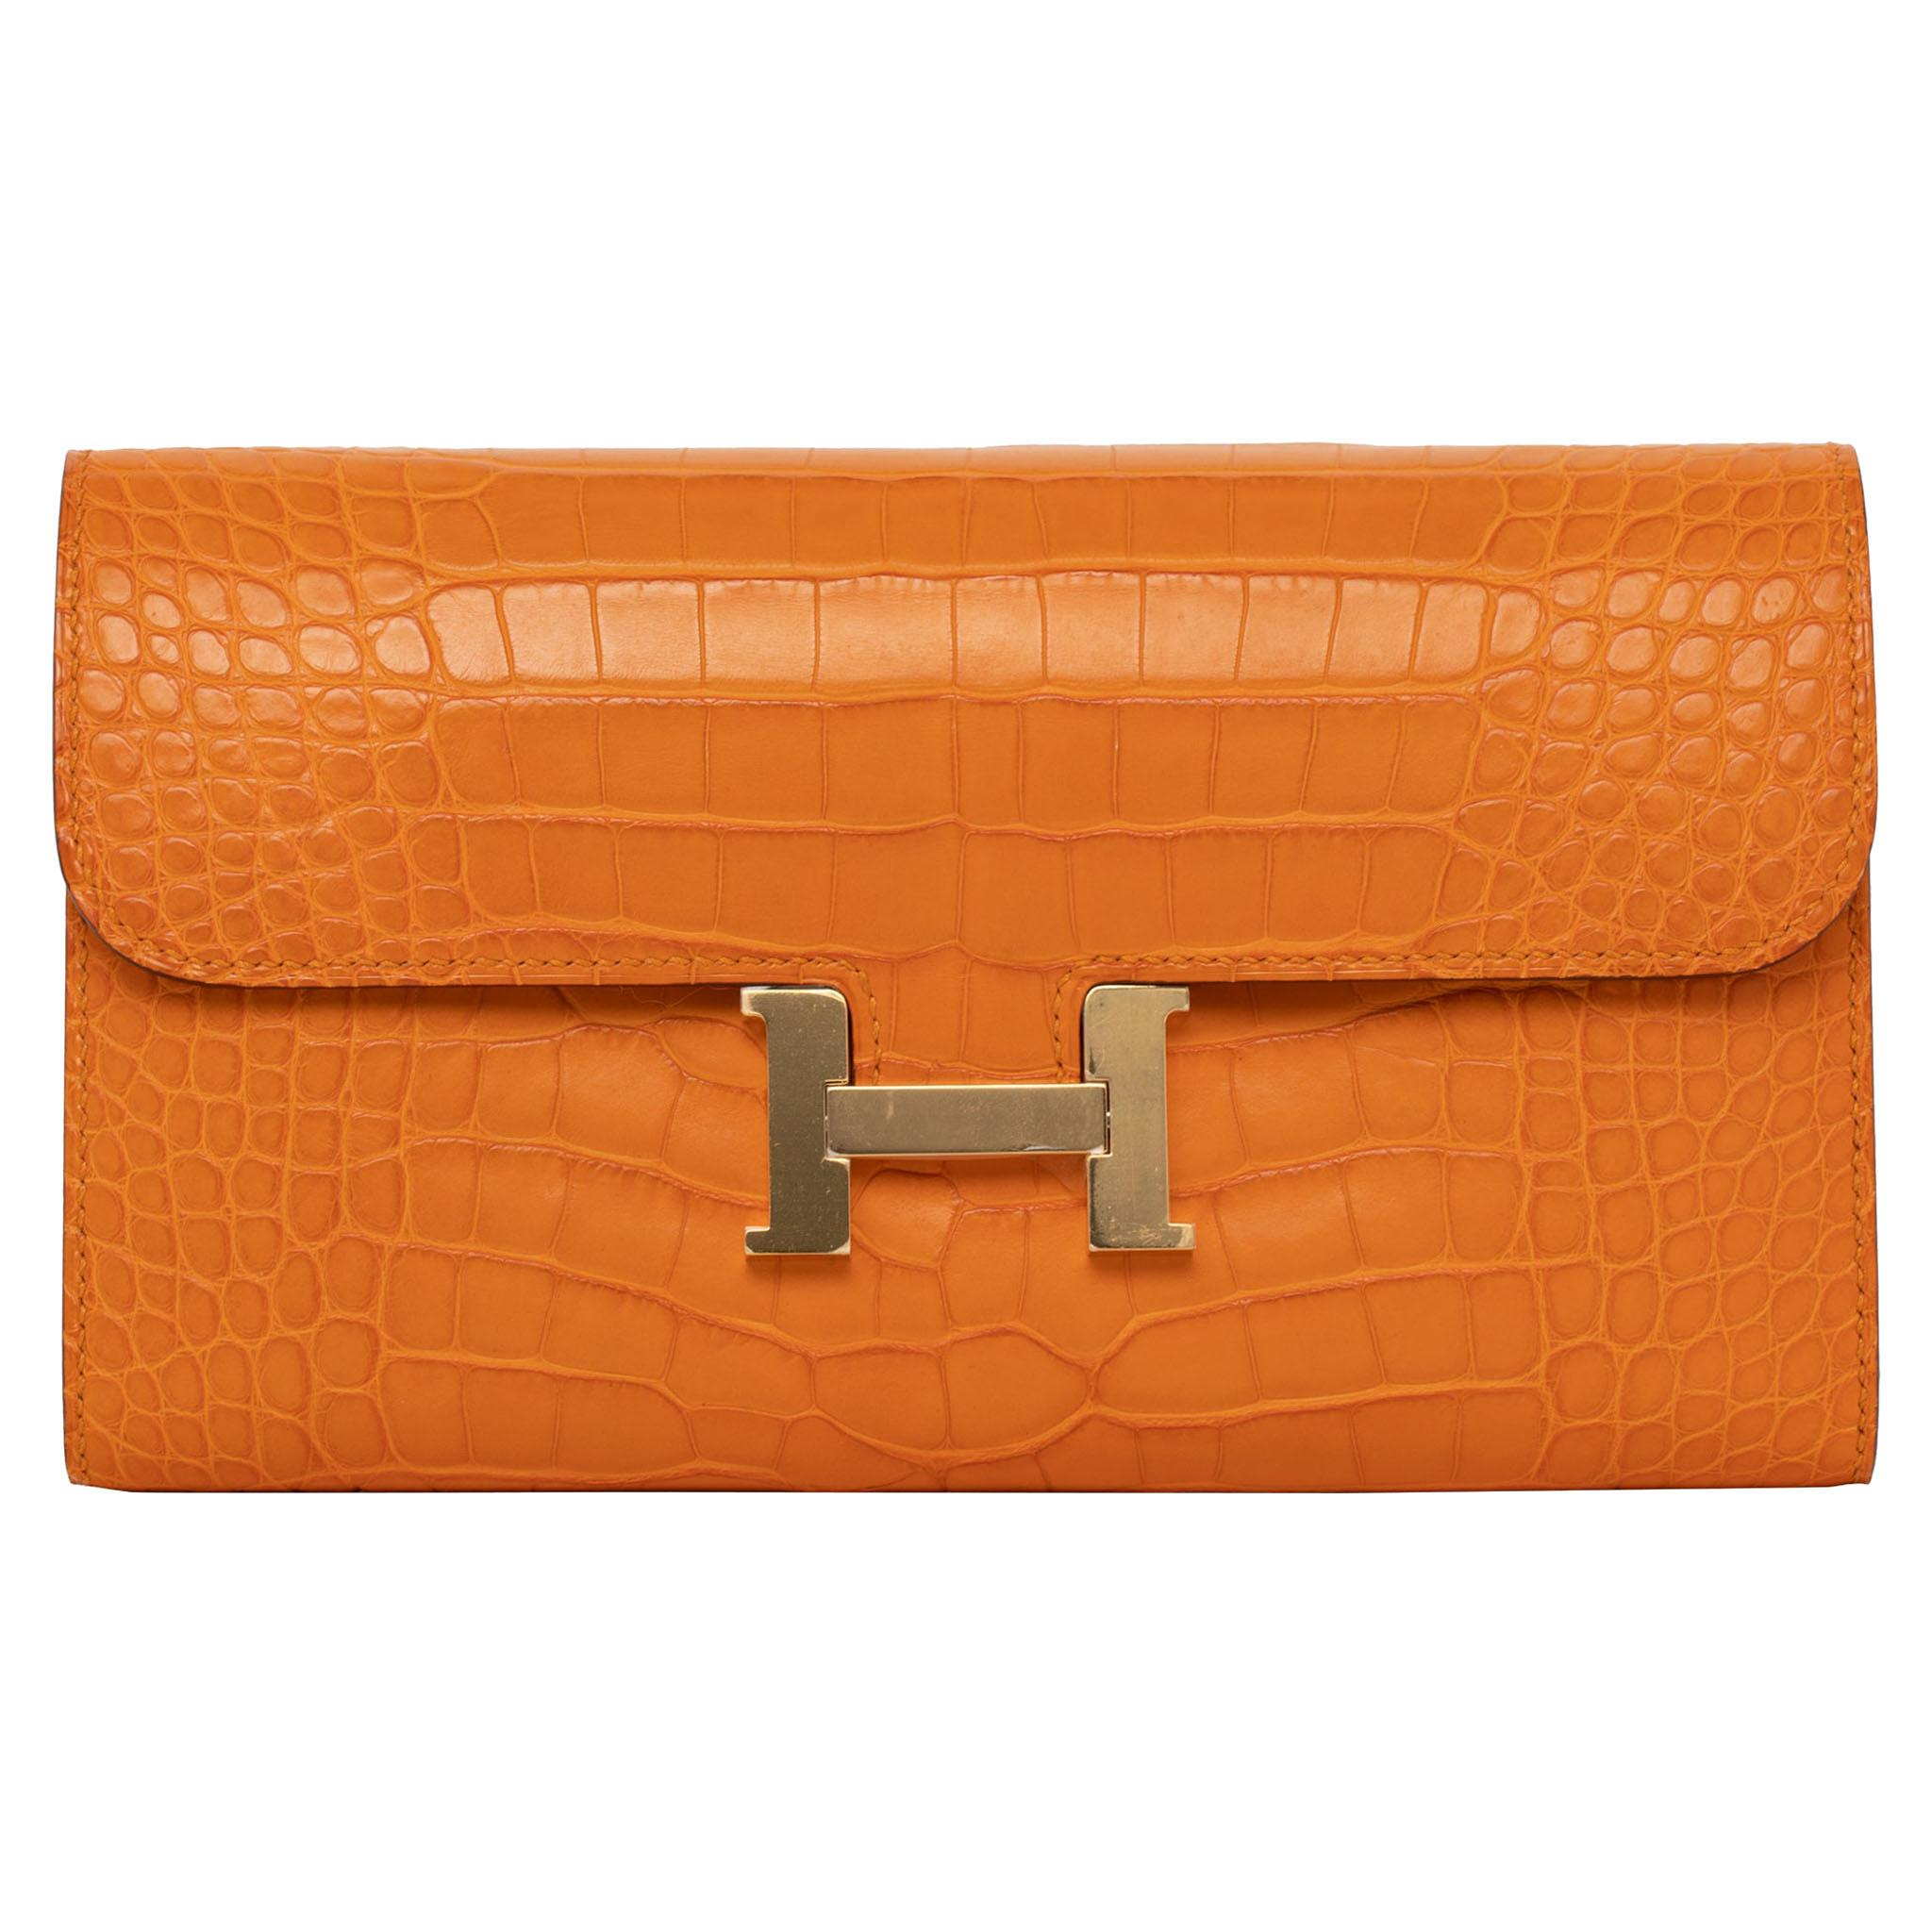 Hermès Constance Long Wallet Abricot Matte Alligator Gold Hardware